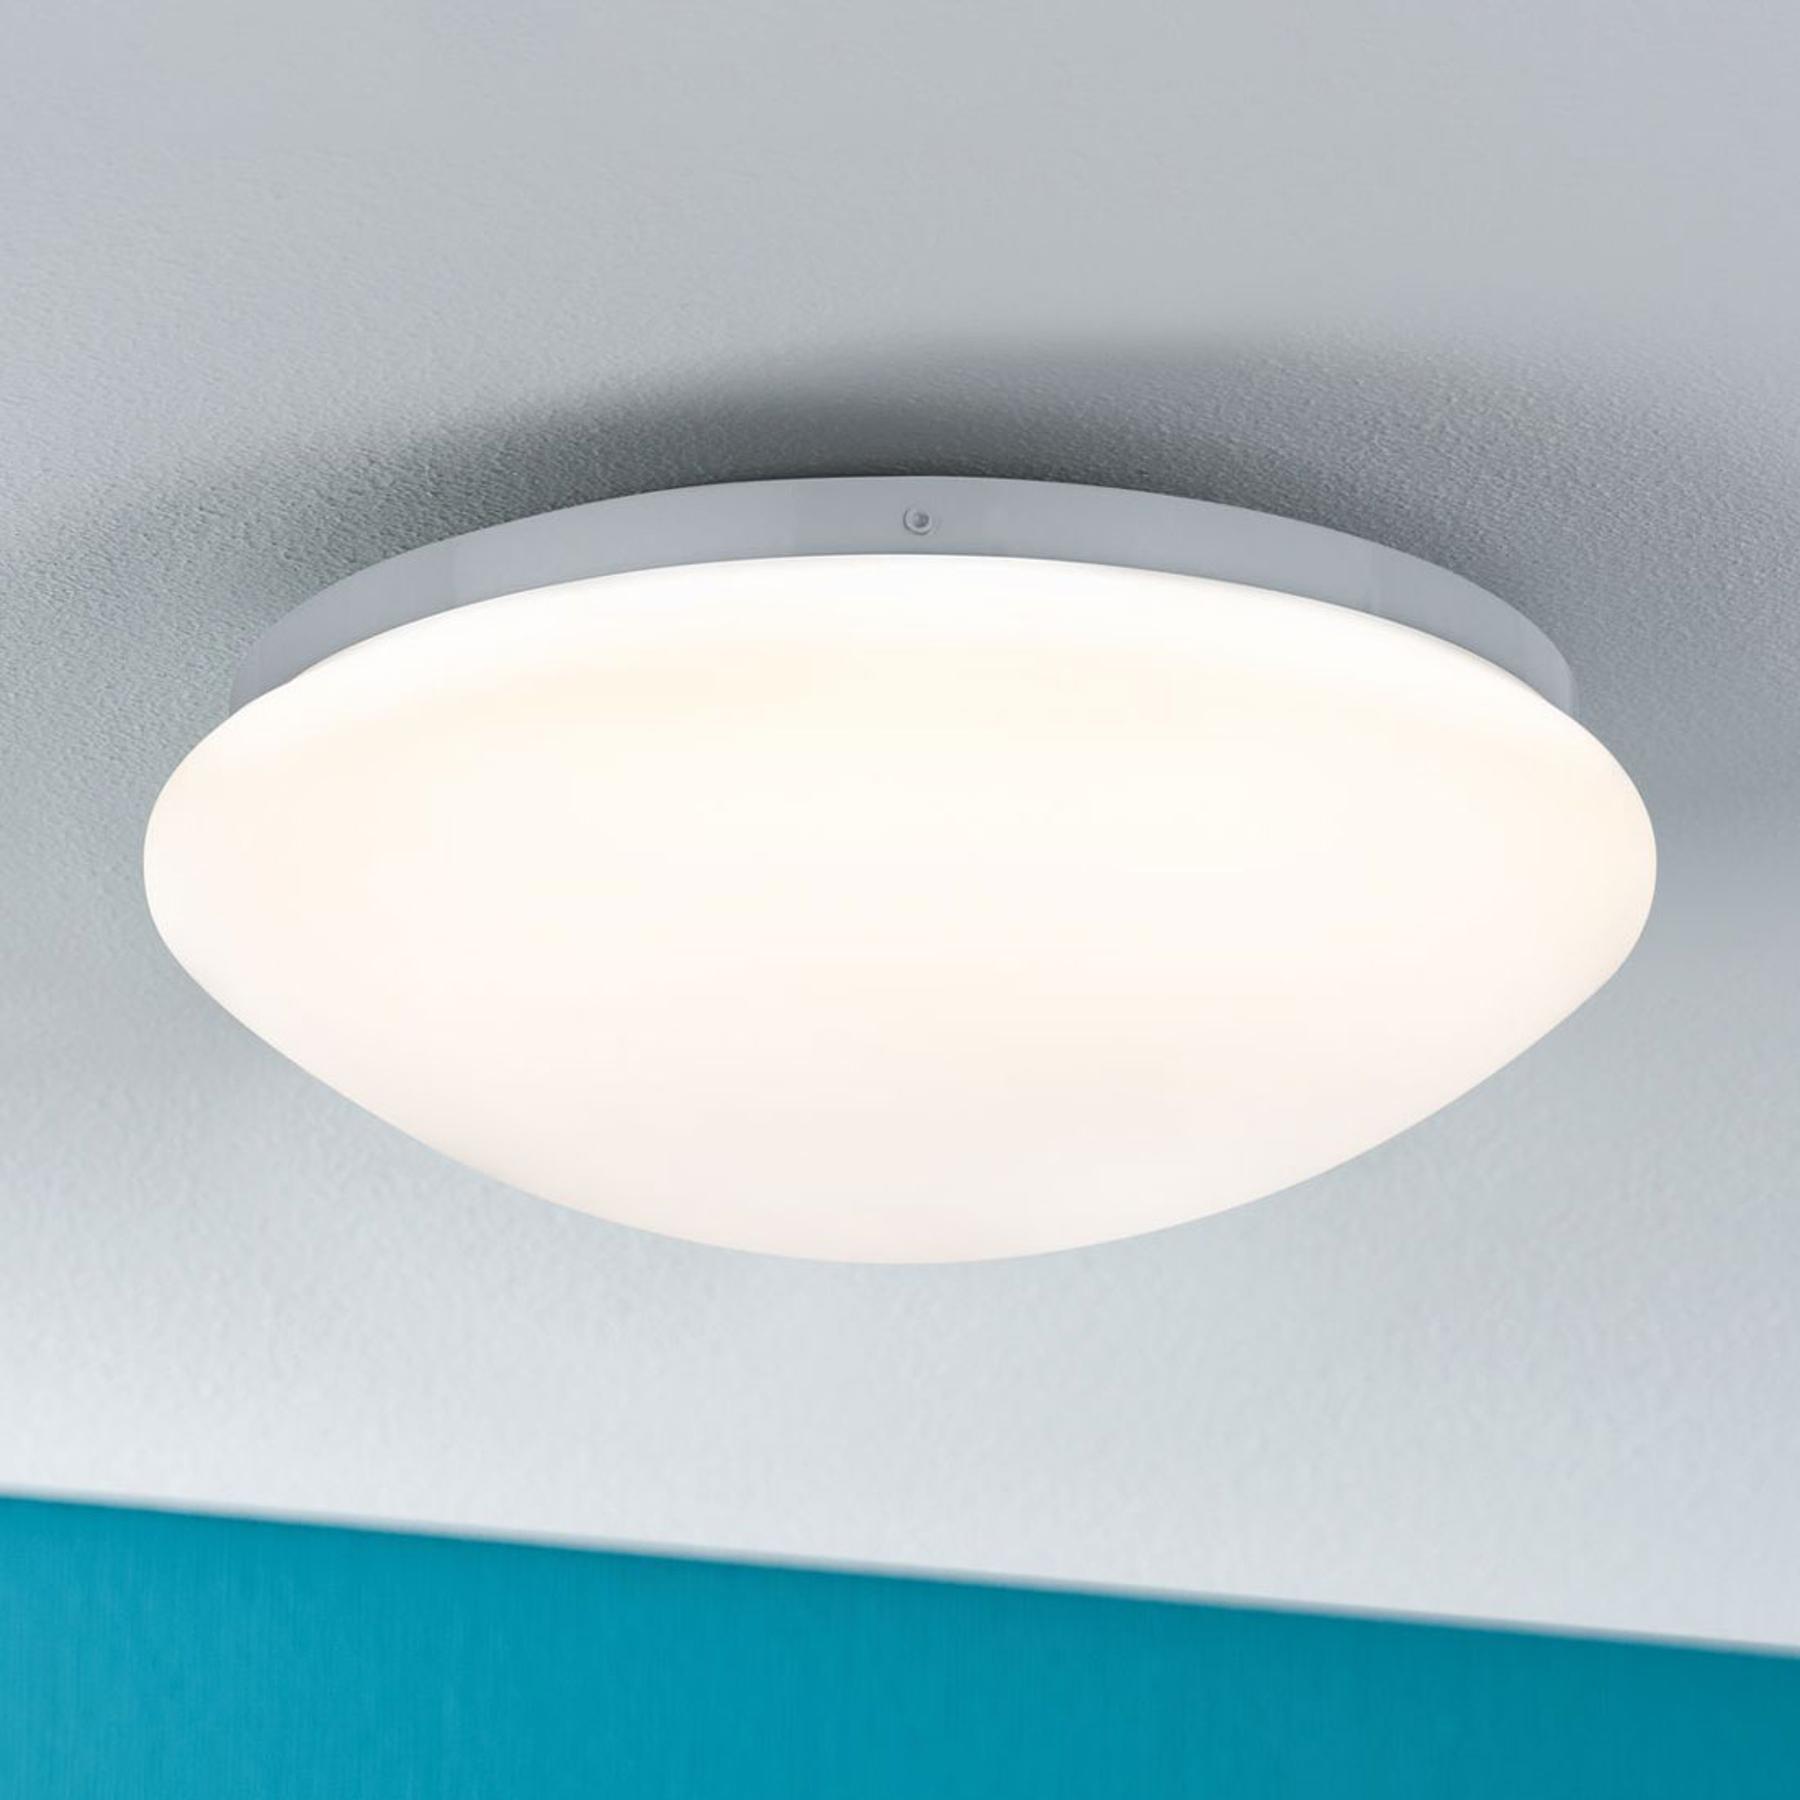 Paulmann Leonis LED plafondlamp 3.000 K, Ø 28 cm